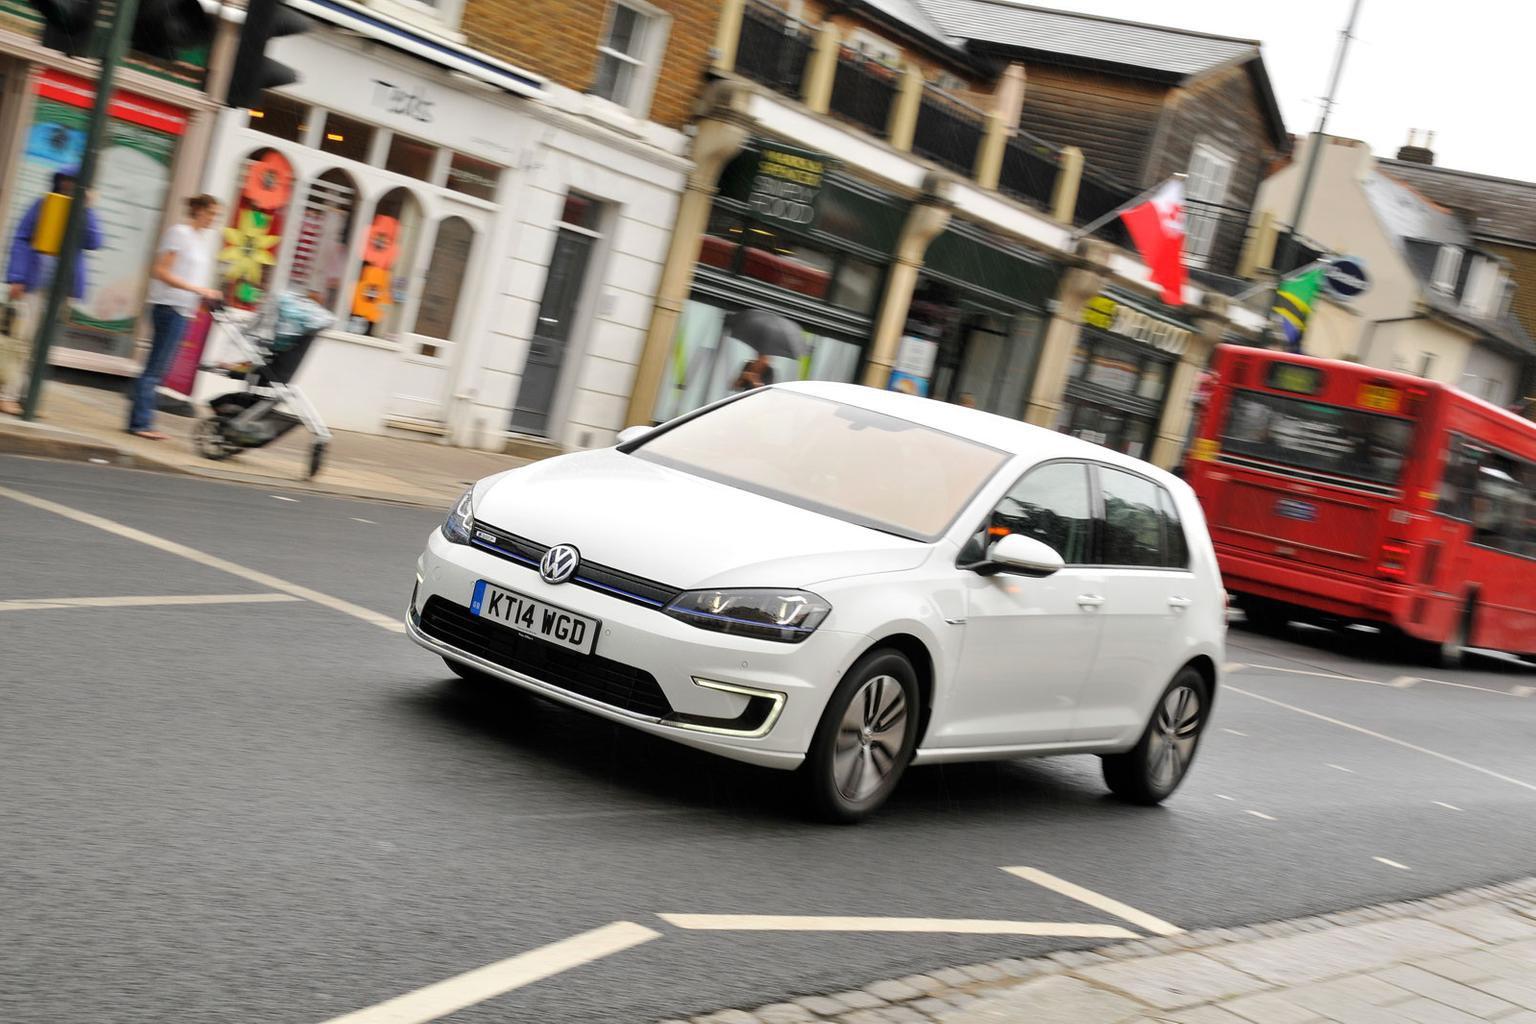 2014 Volkswagen e-Golf review